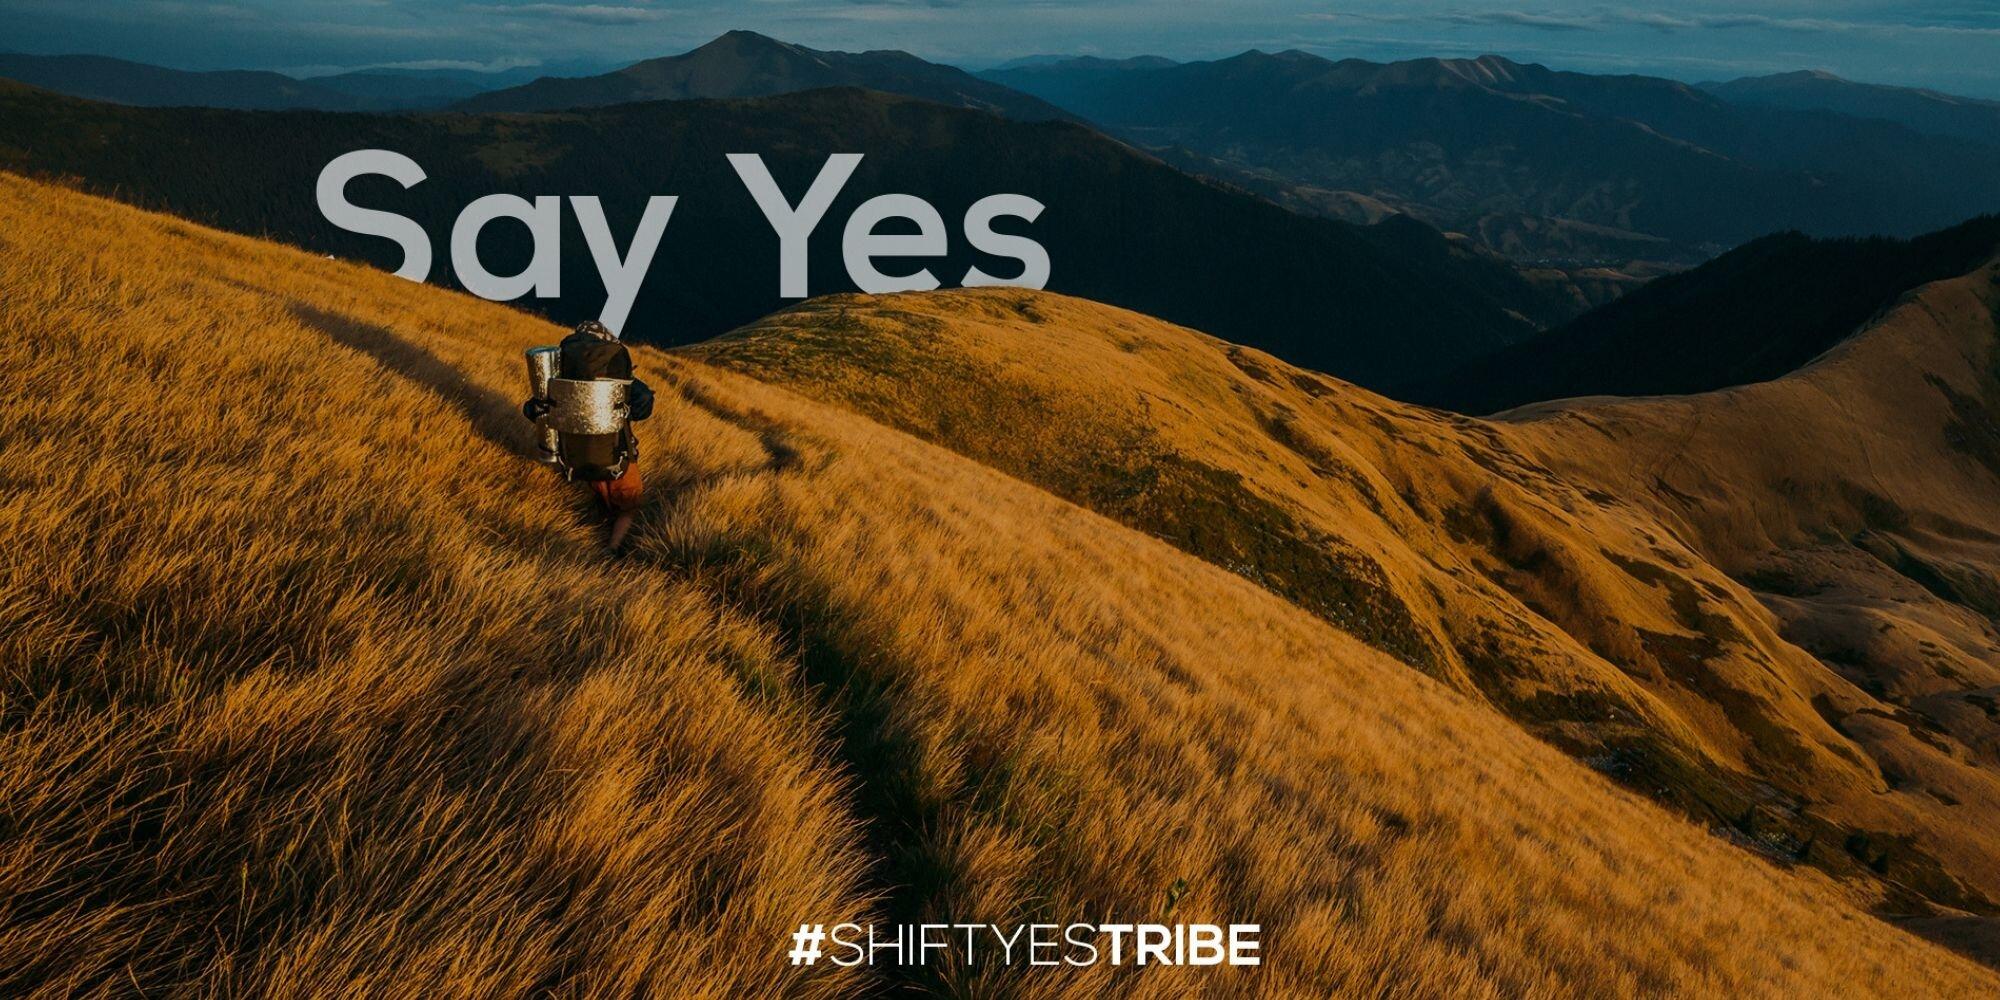 Galen Emanuele #shiftyestribe Shift Yes Tribe Saying Yes February 2019.jpg